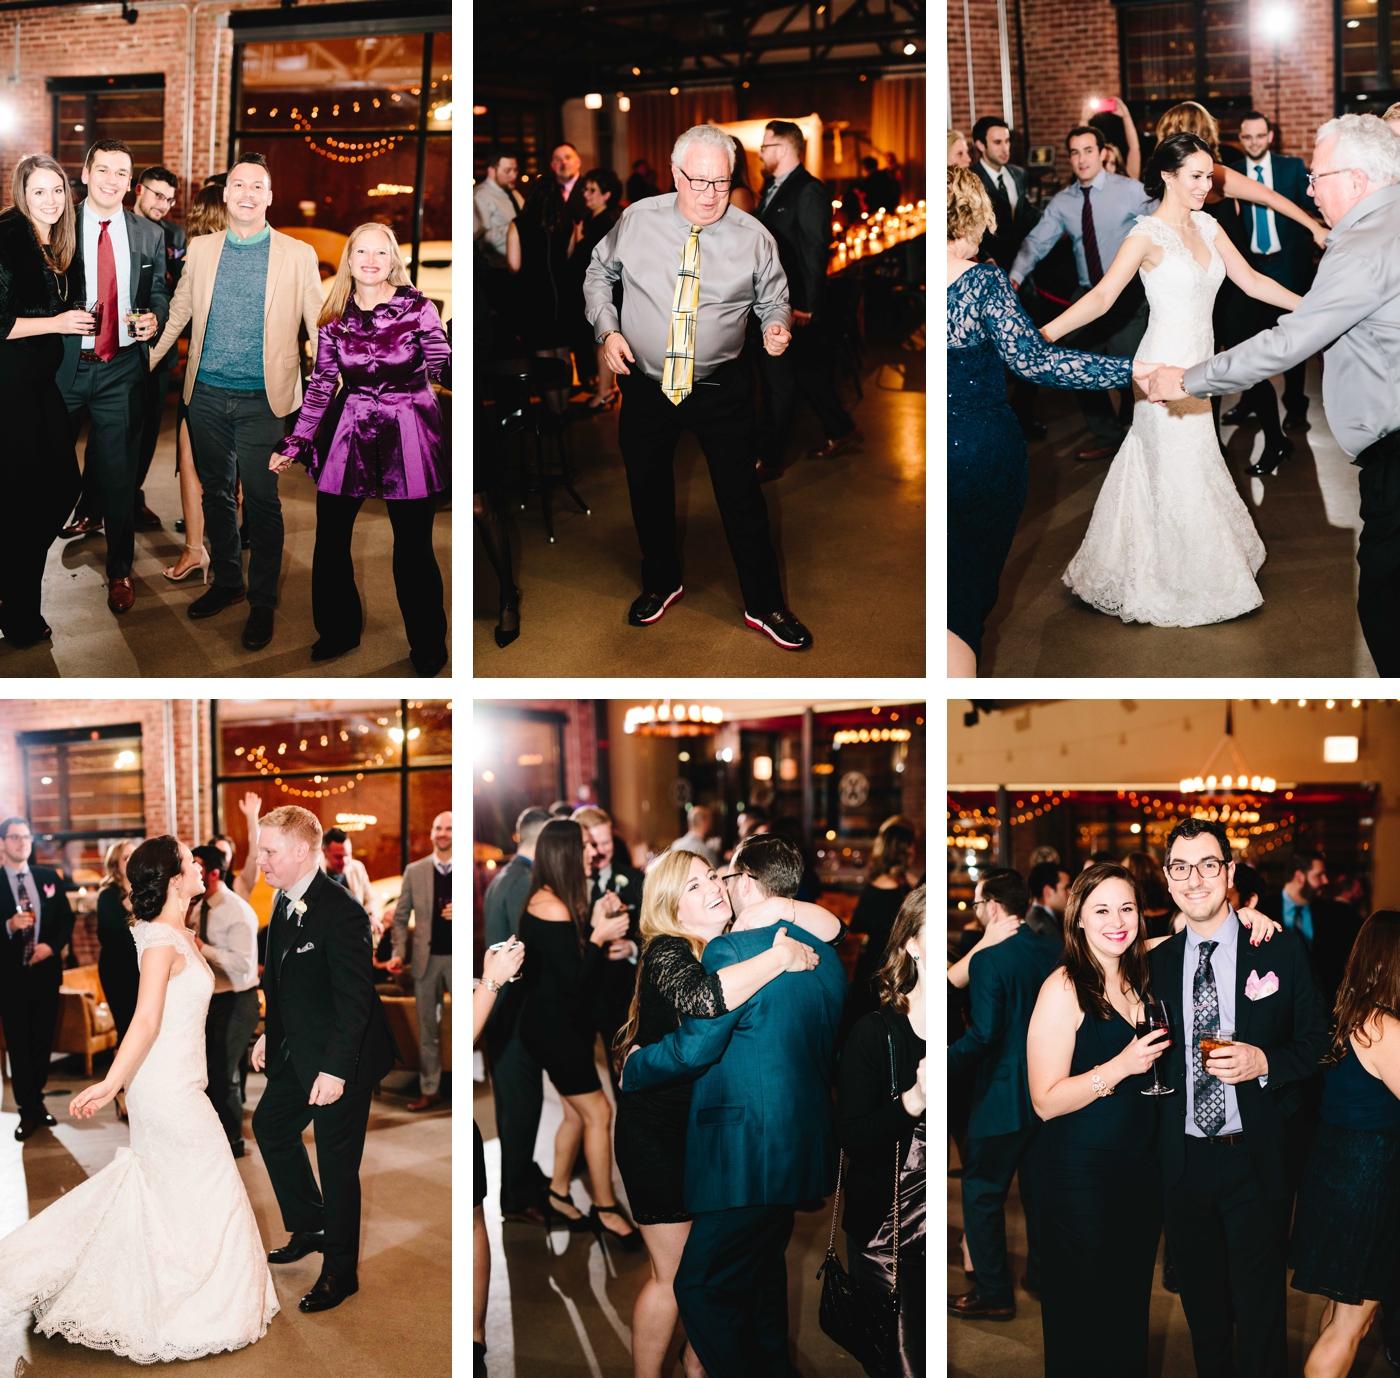 chicago-fine-art-wedding-photography-lintelman51